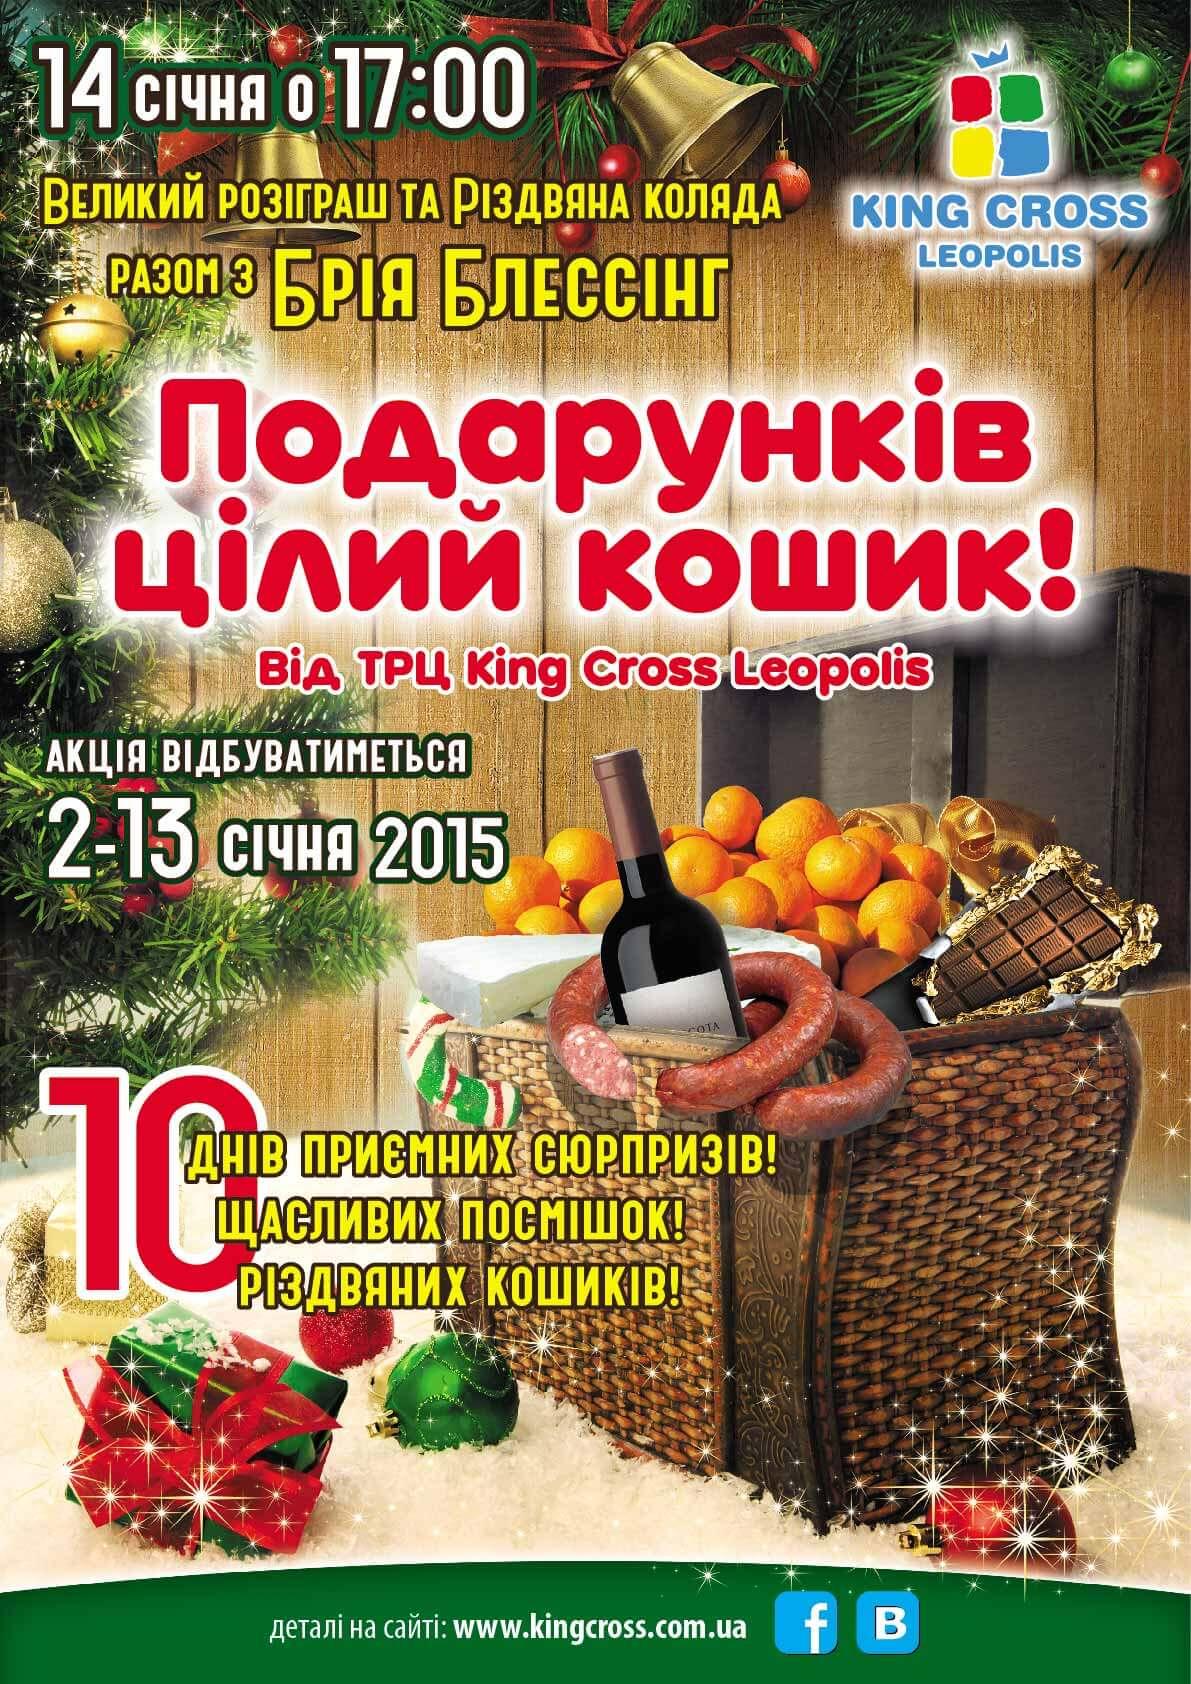 flaer_Koshyk_cond